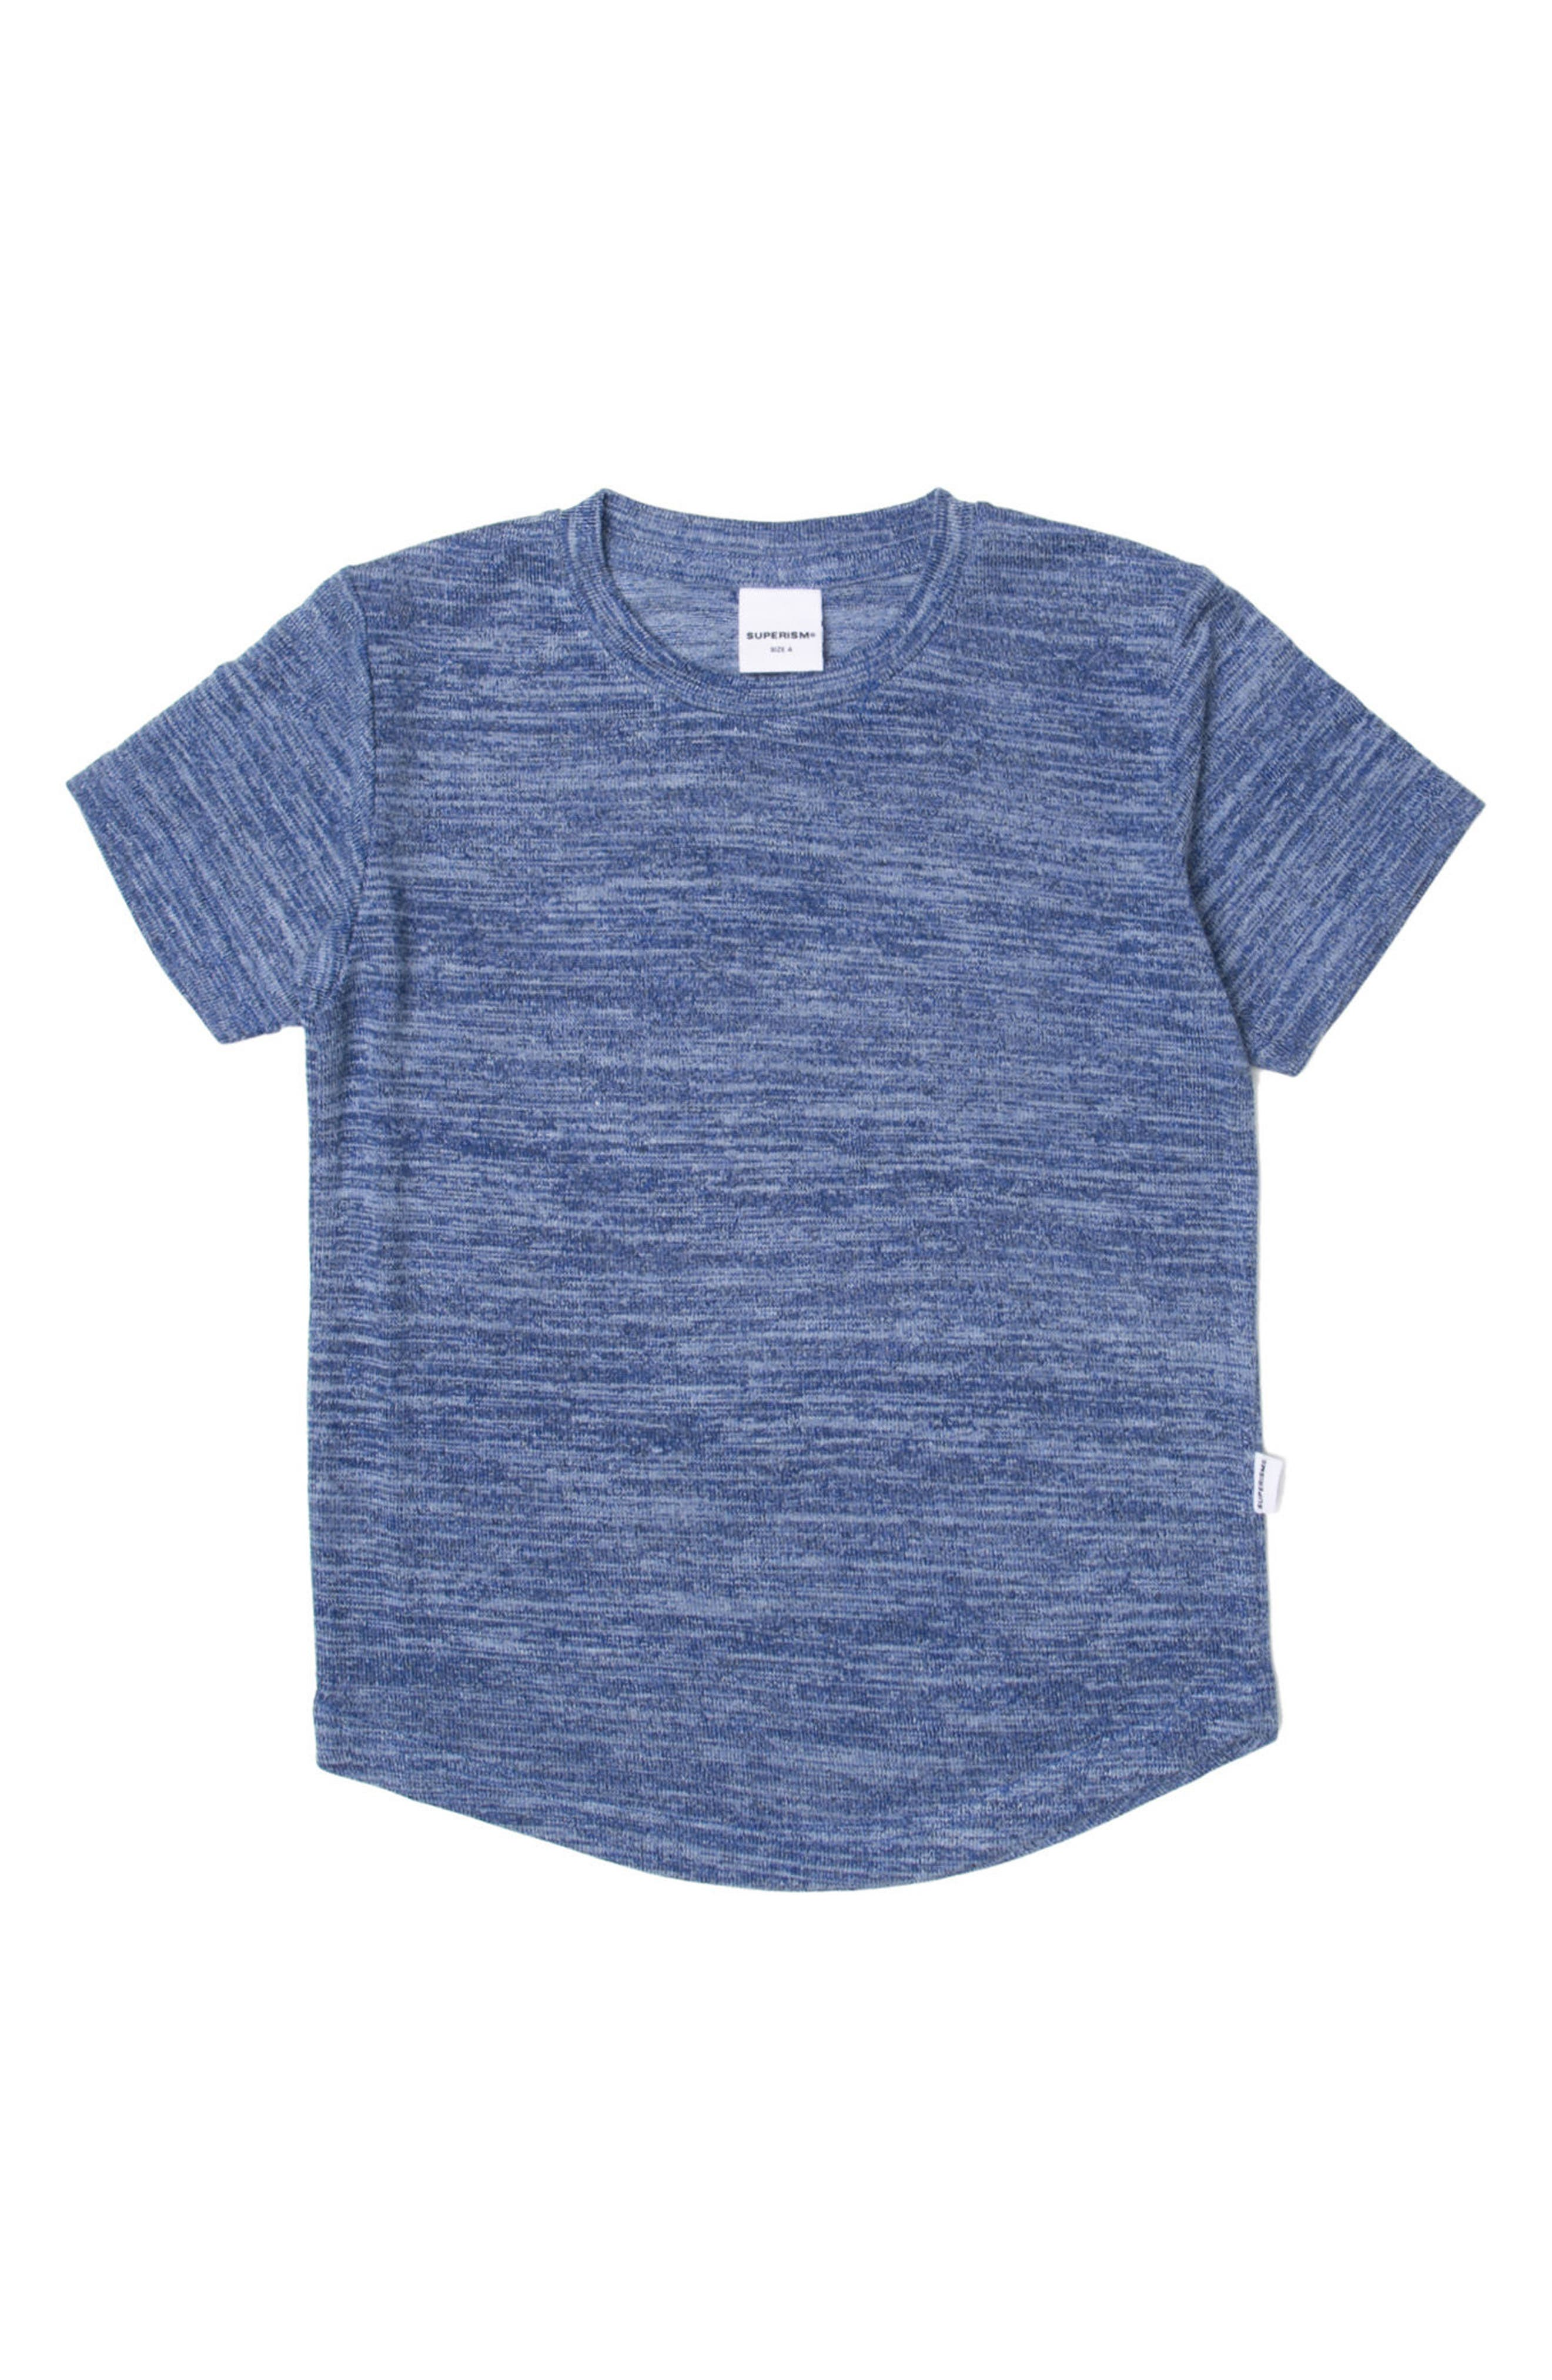 Alternate Image 1 Selected - Superism Landon T-Shirt (Toddler Boys & Little Boys)